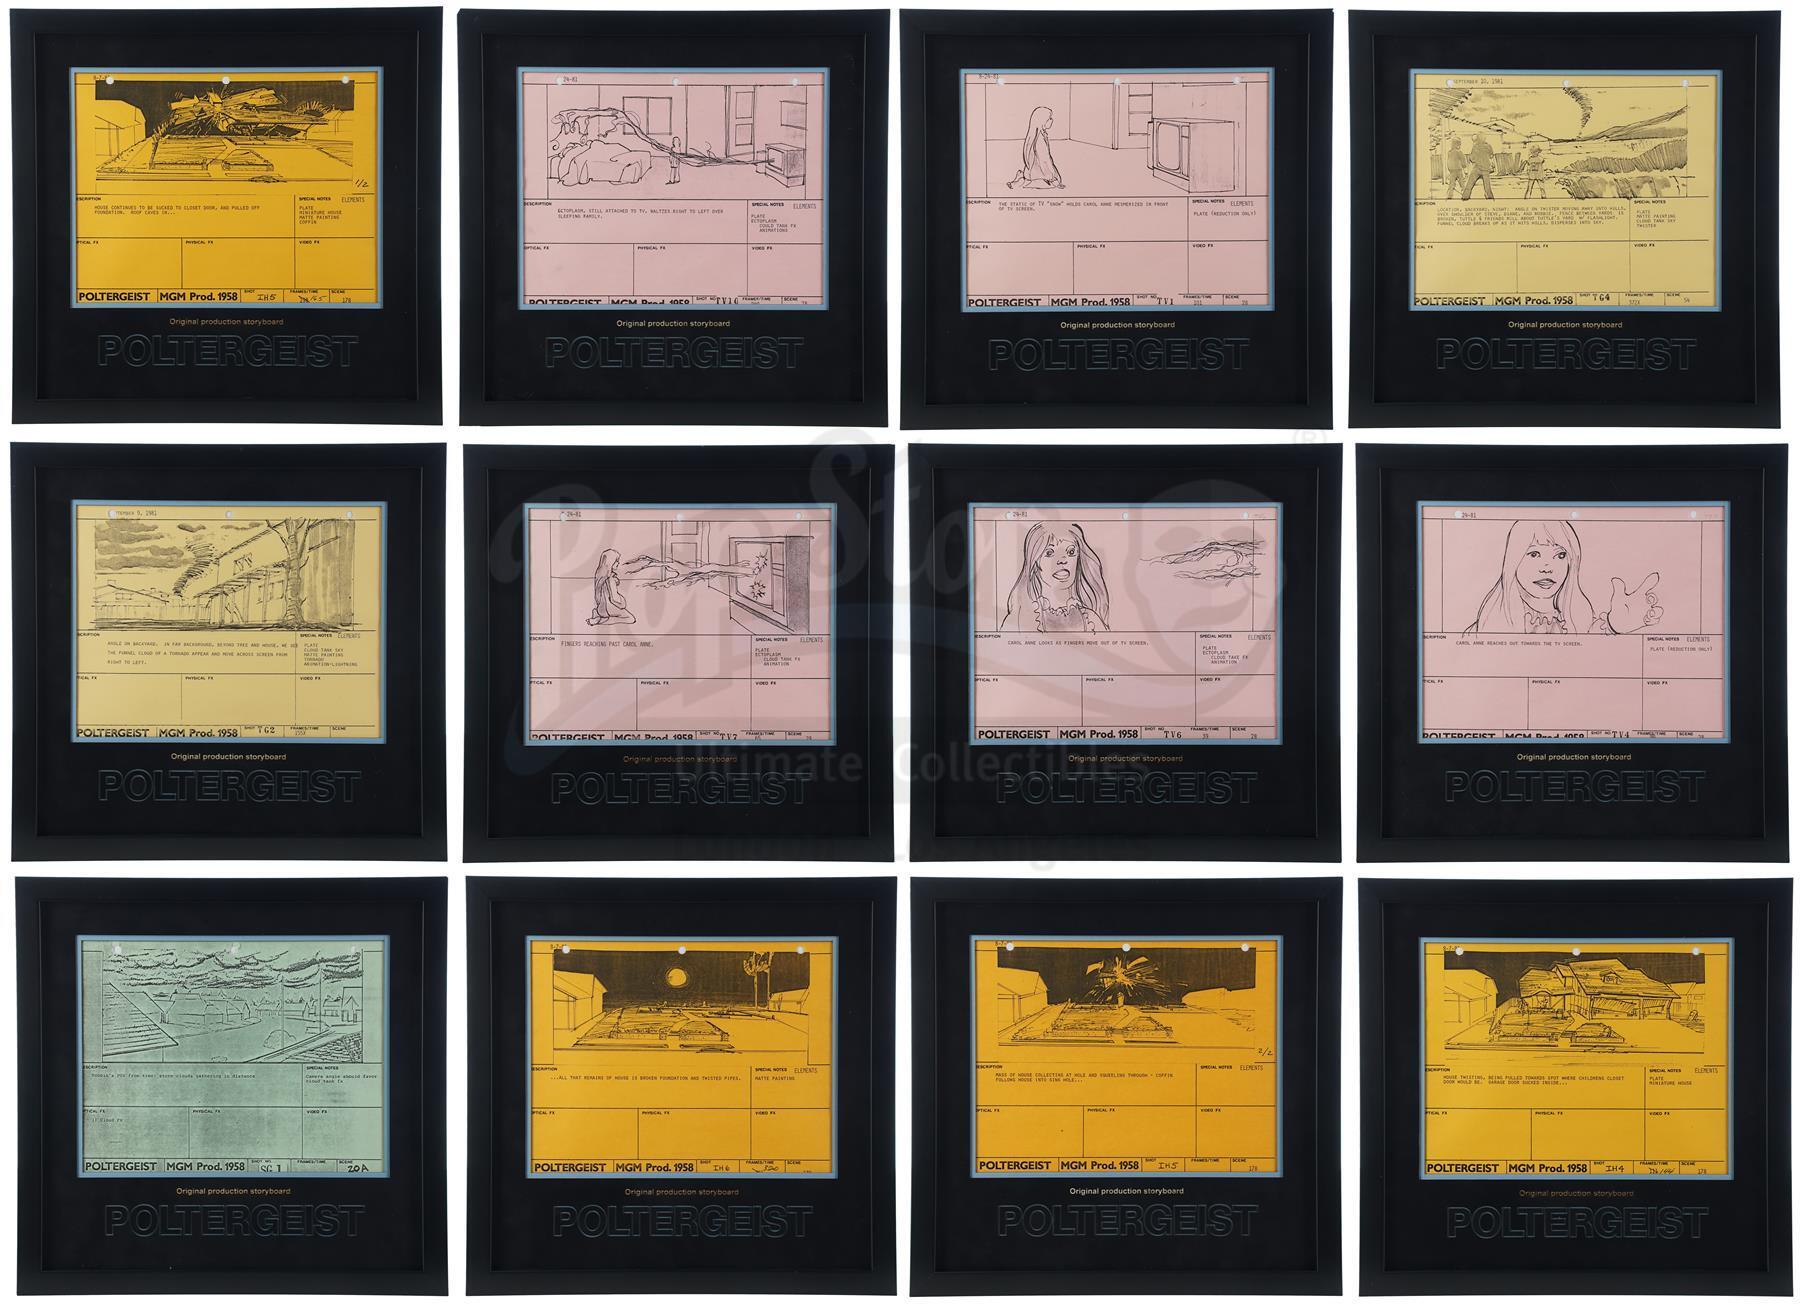 Lot # 970: POLTERGEIST - Original Production Framed Storyboards